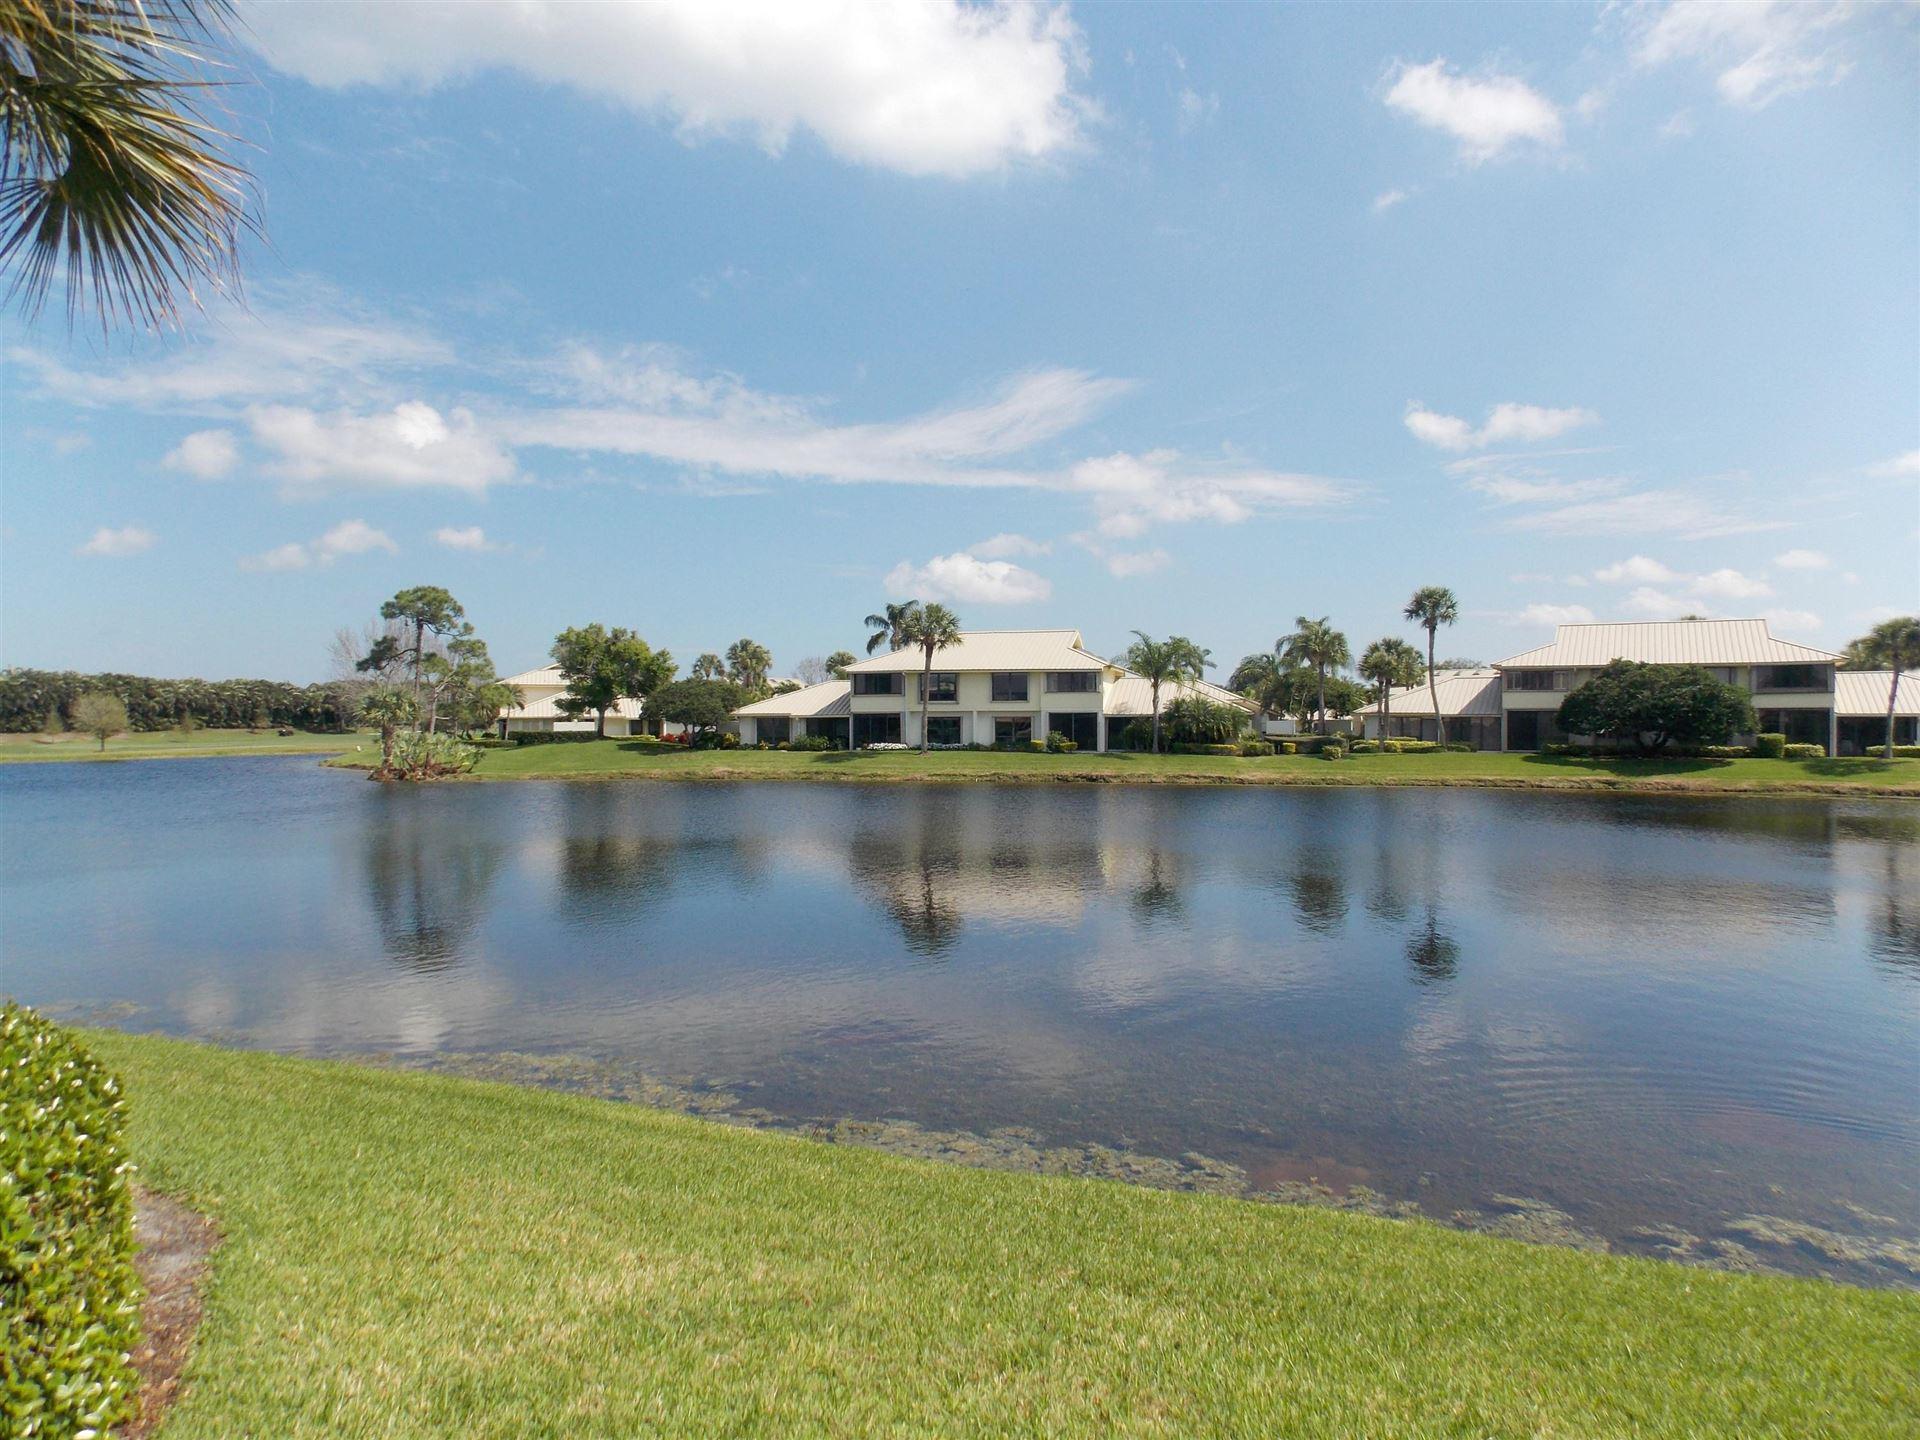 5641 SE Foxcross Place, Stuart, FL 34997 - #: RX-10628049